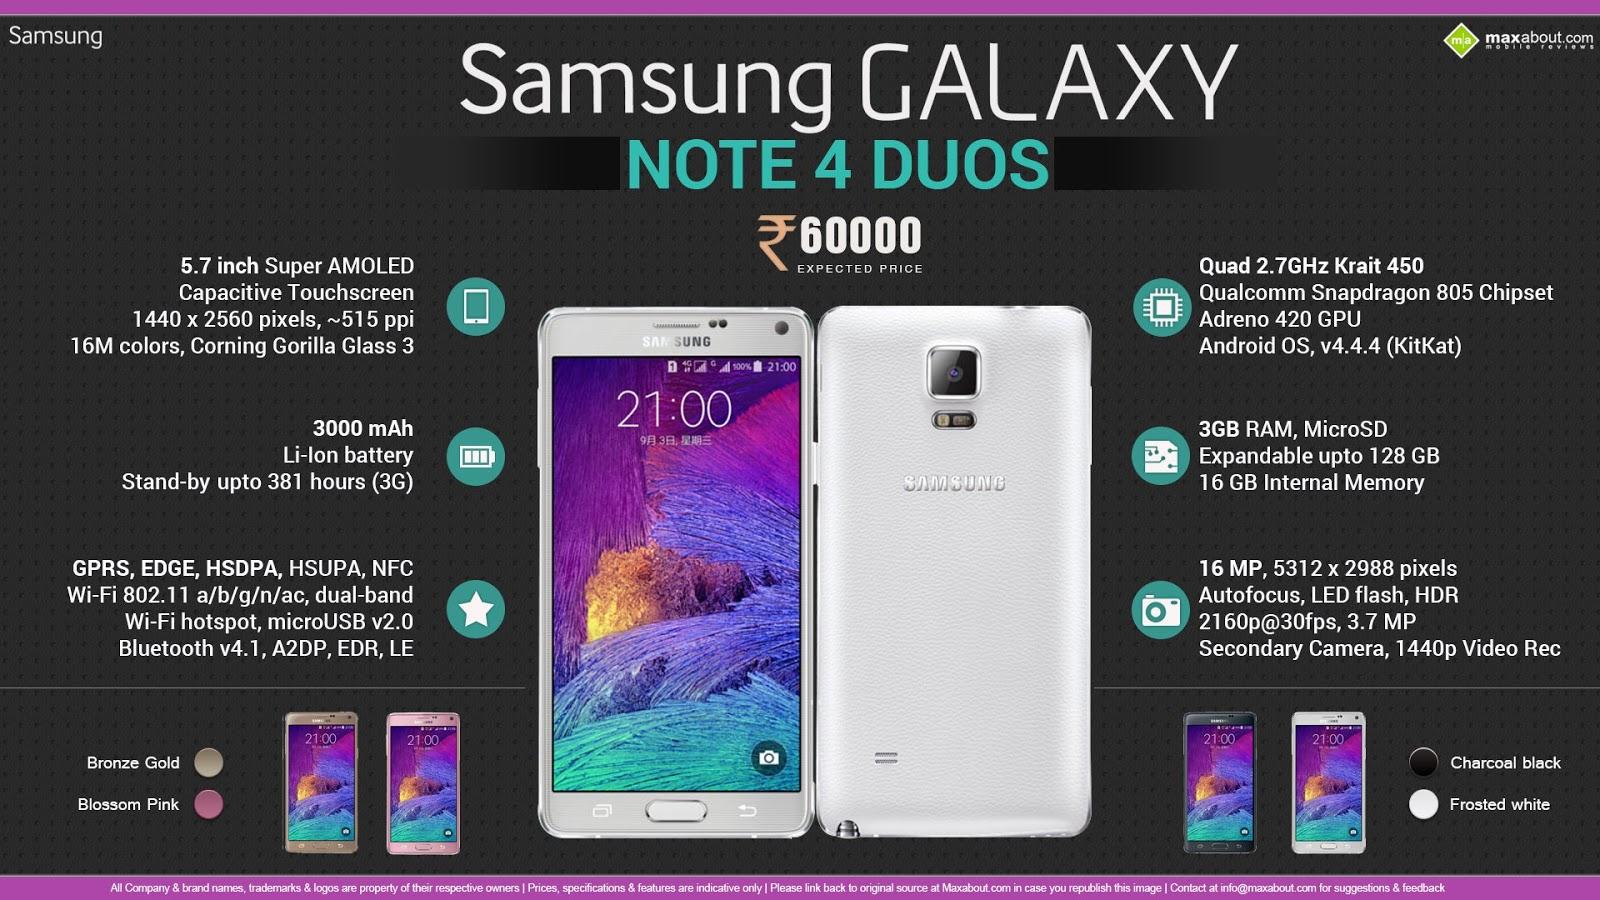 harga dan spesifikasi samsung galaxy note 4 duos terbaru